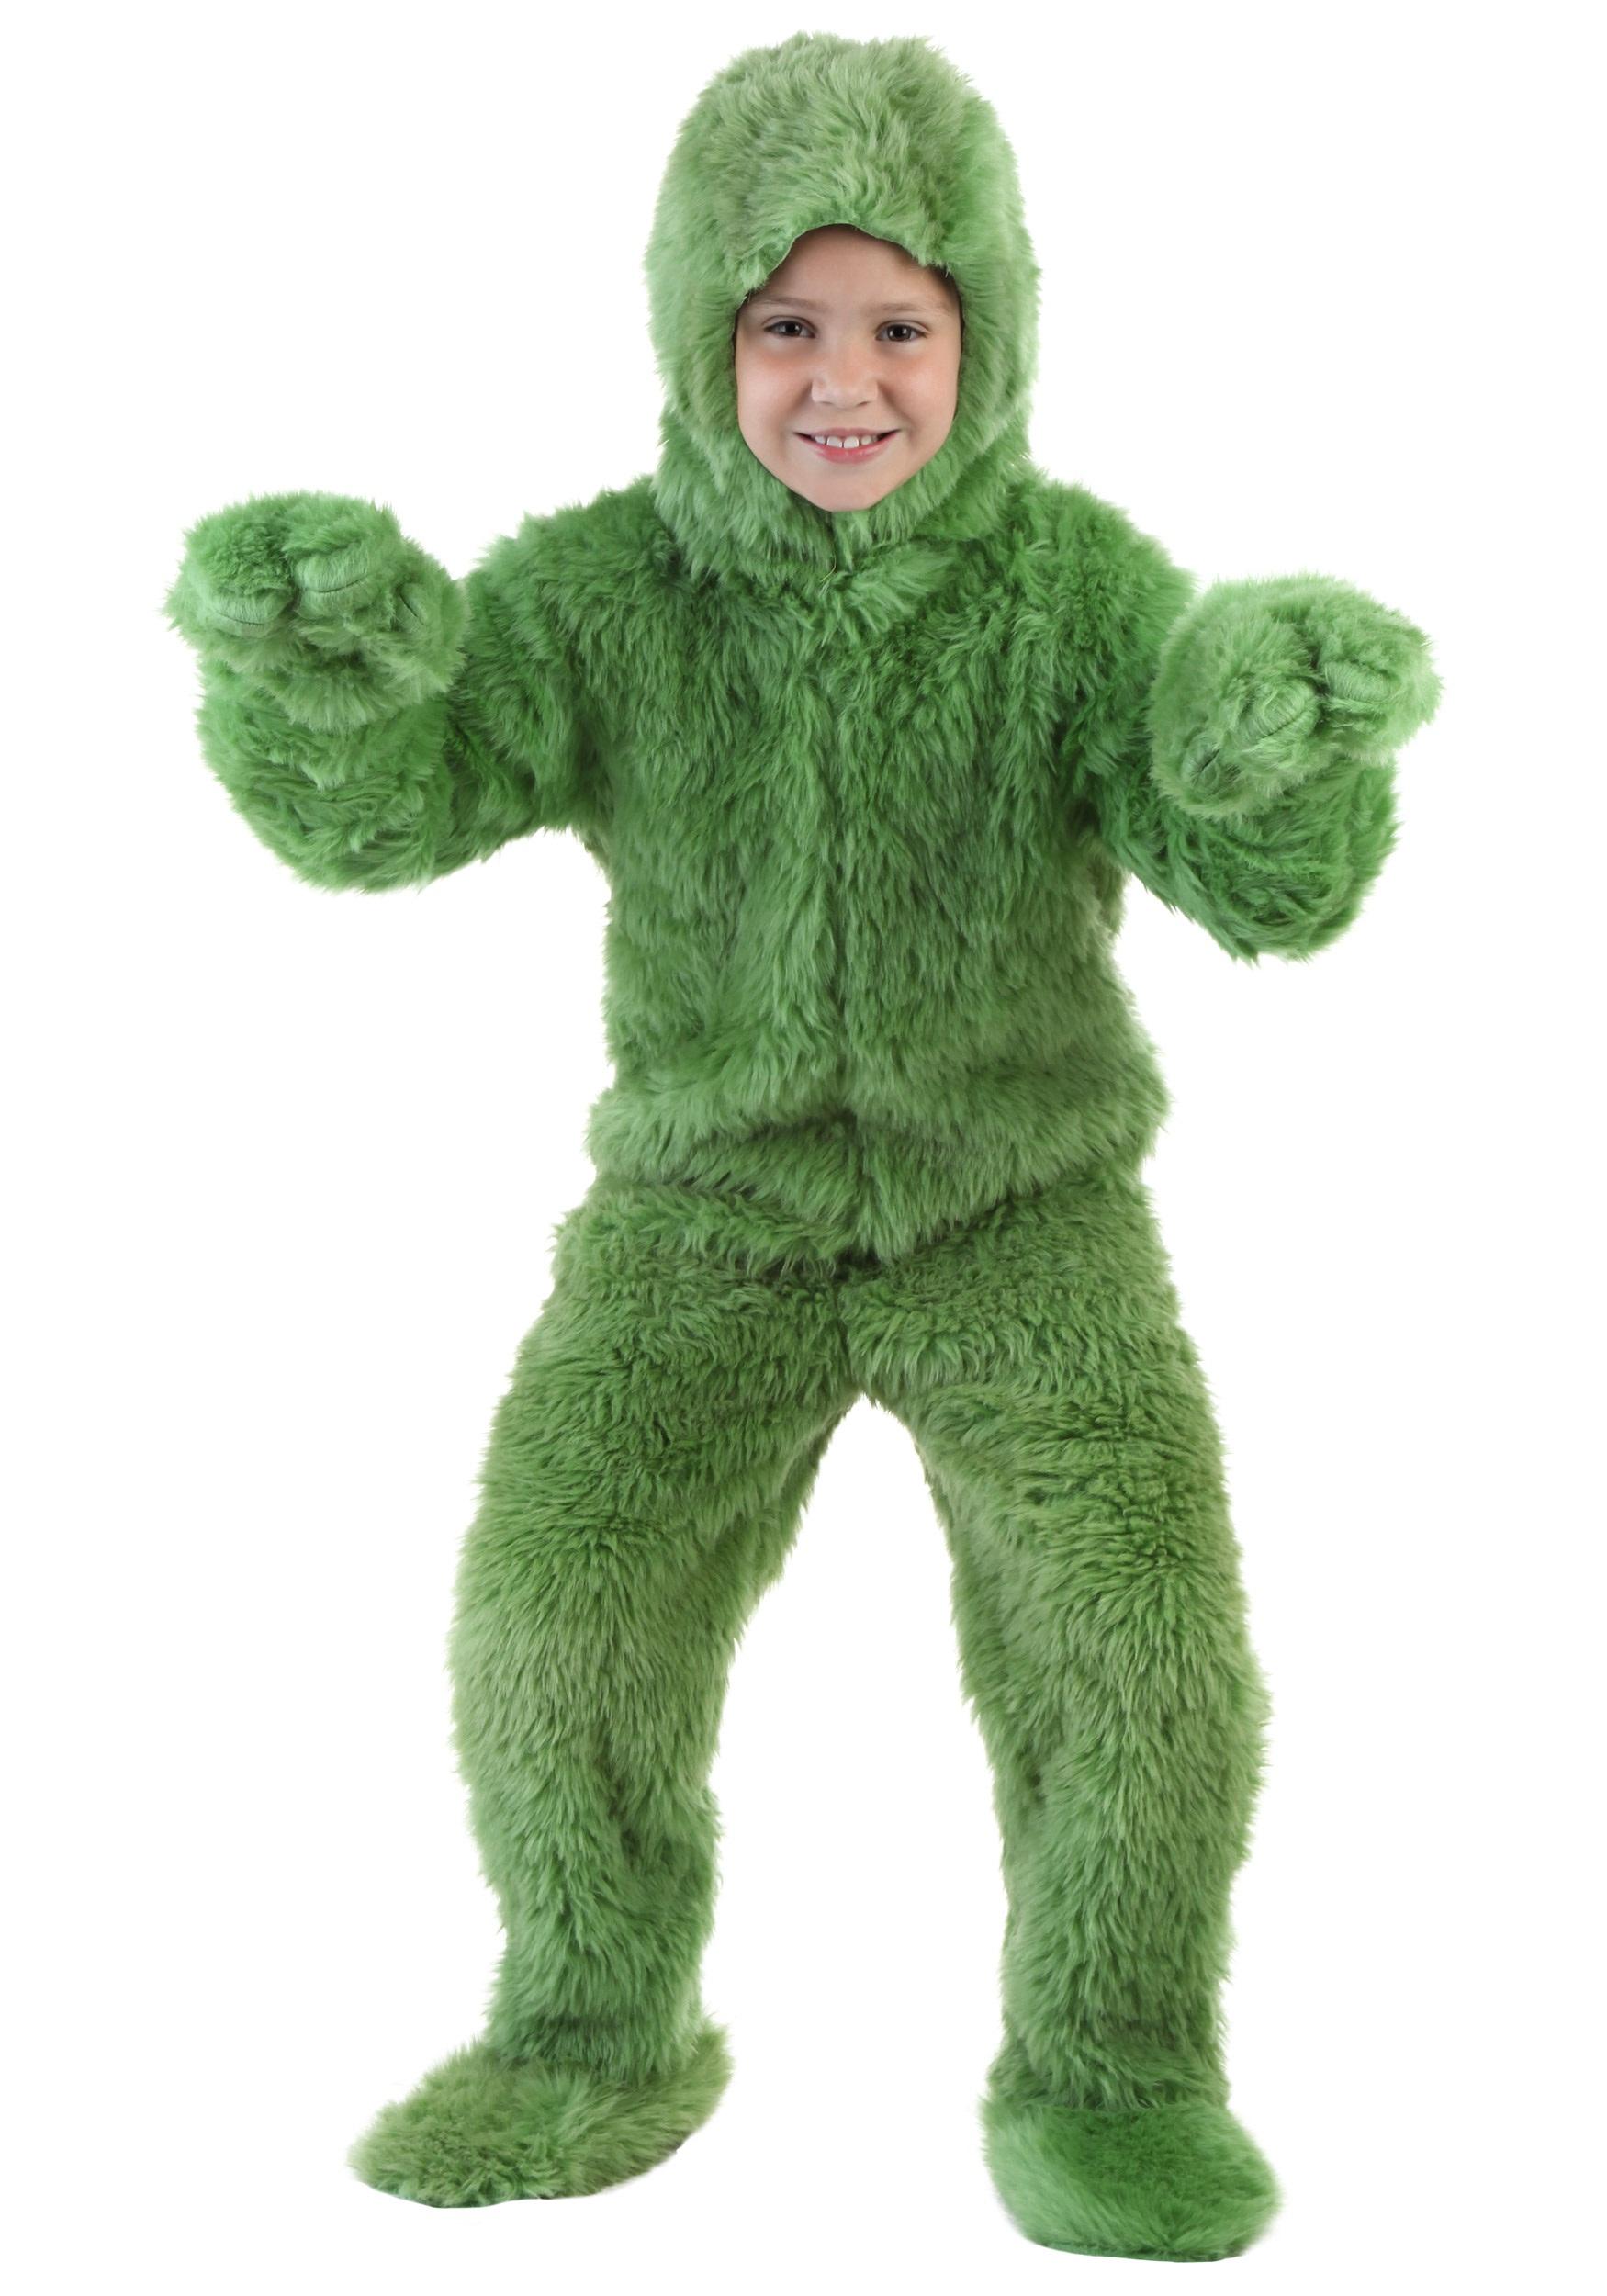 Green Furry Jumpsuit Costume